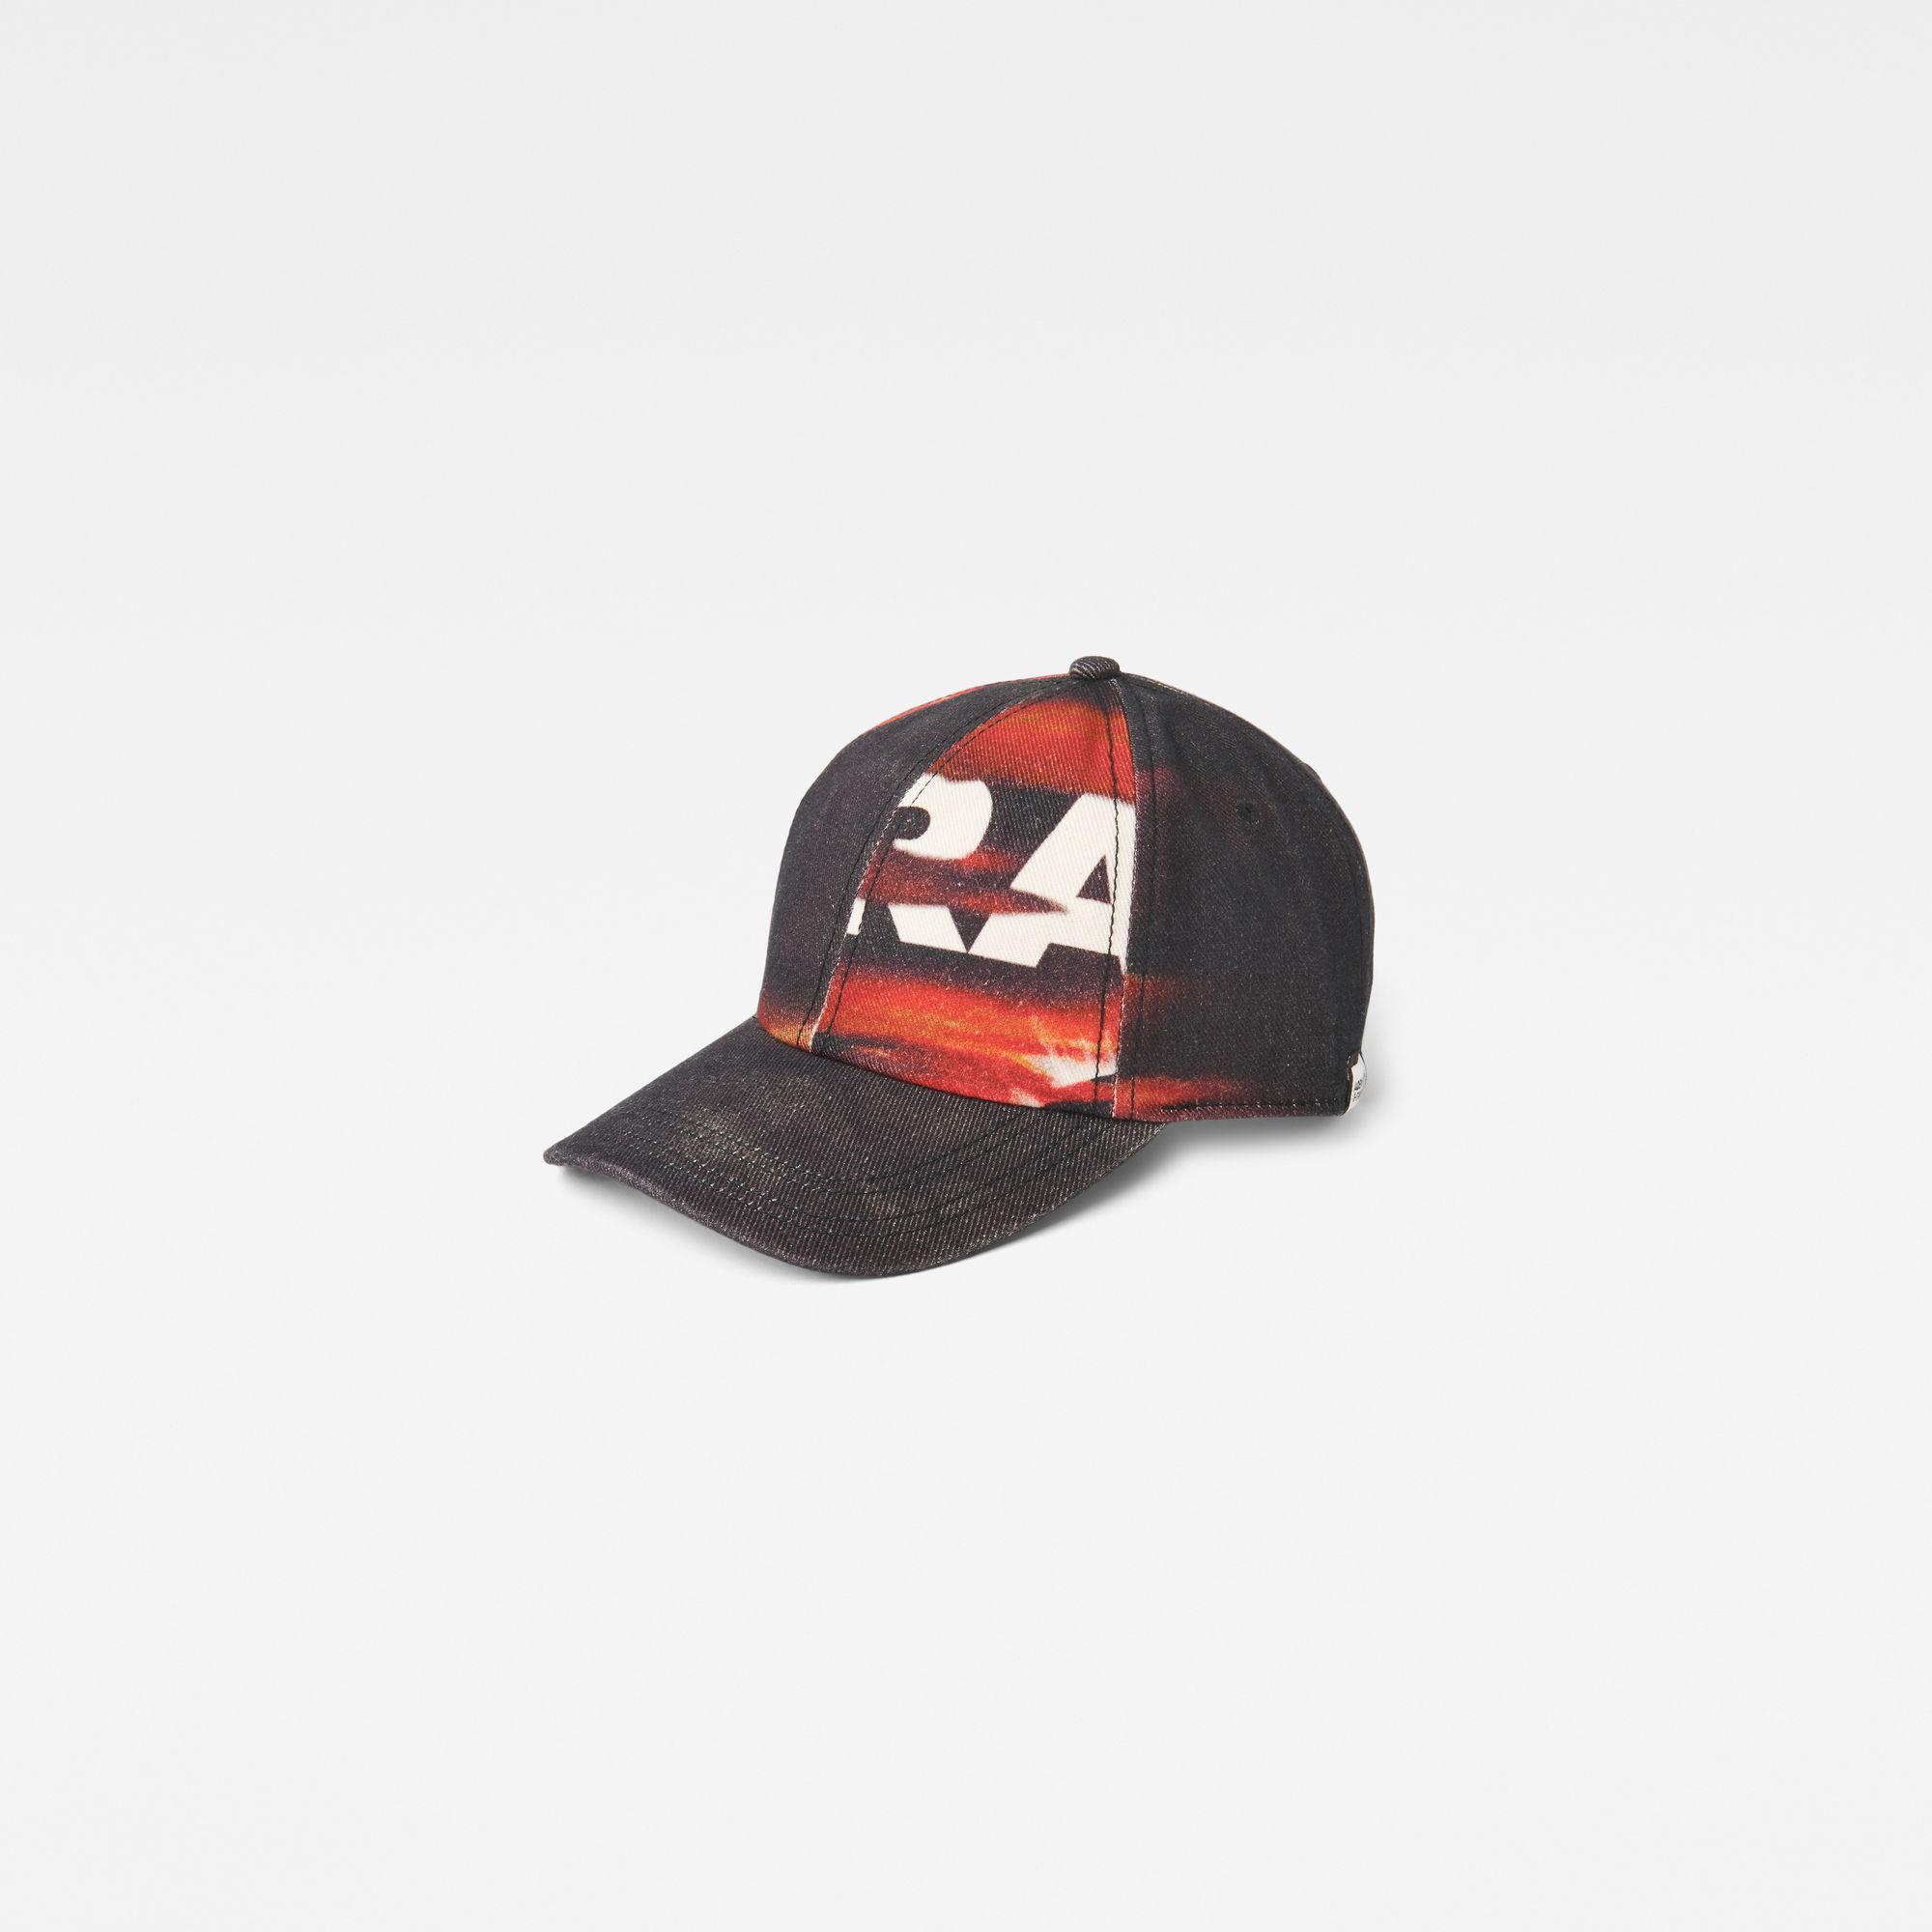 Van G Star Raw Avernus RFTP Eclipse Baseball Cap Prijsvergelijk nu!